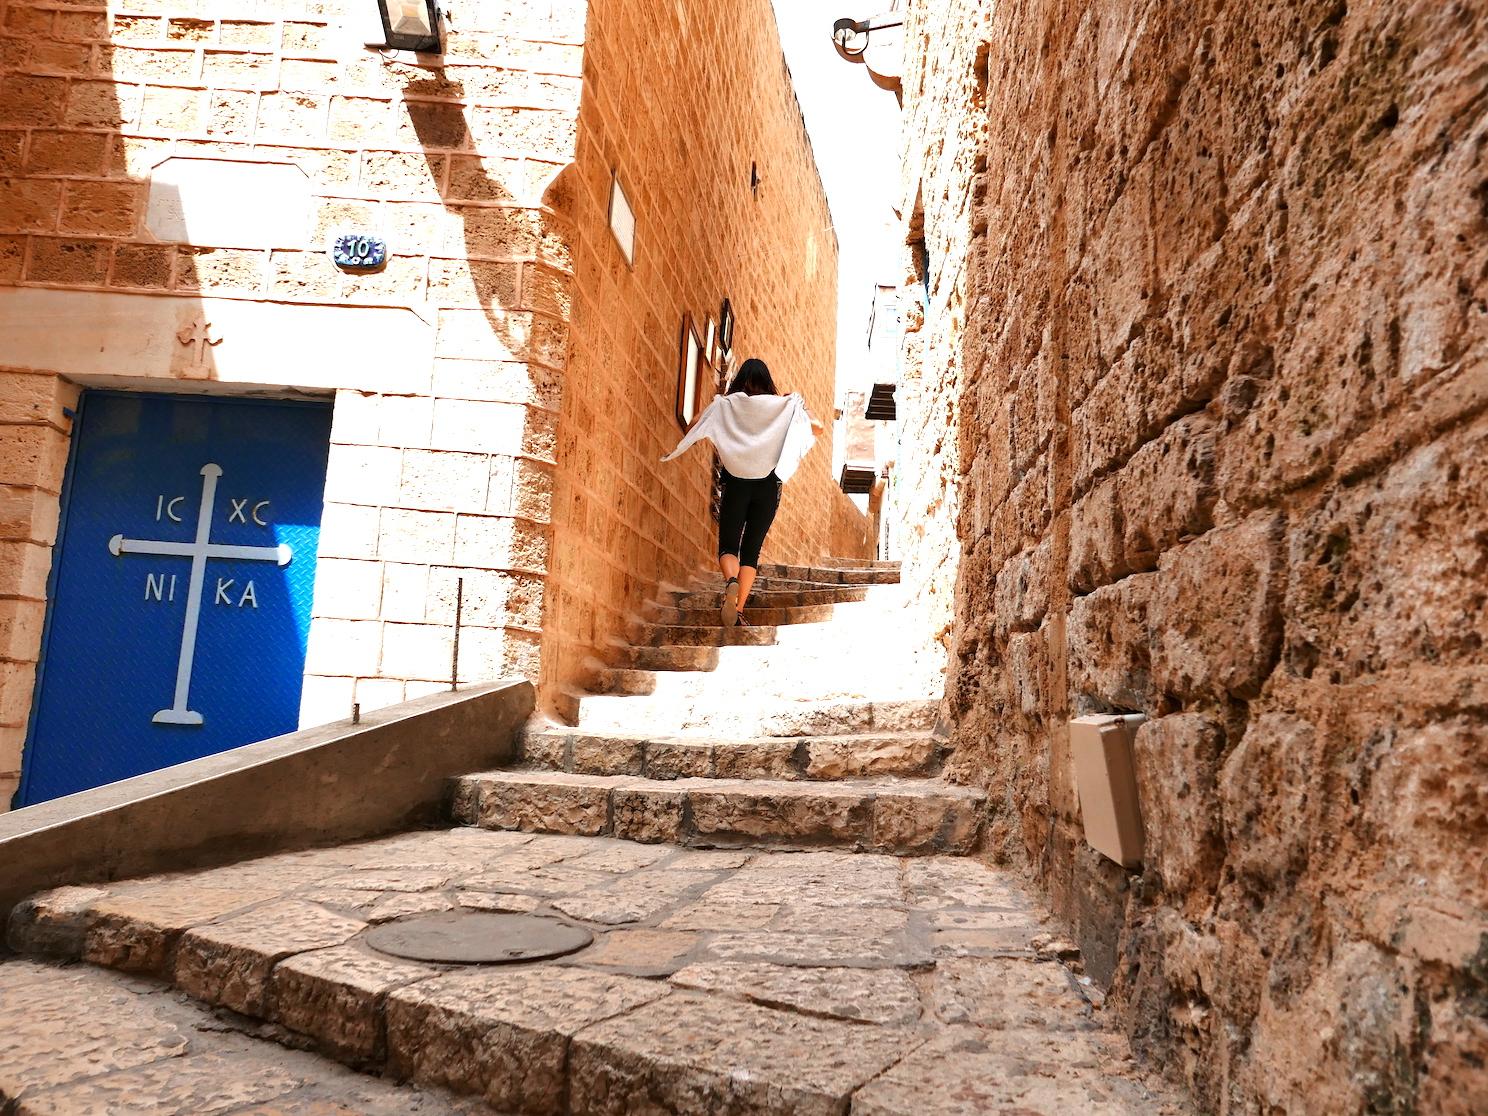 Israel - June 2016